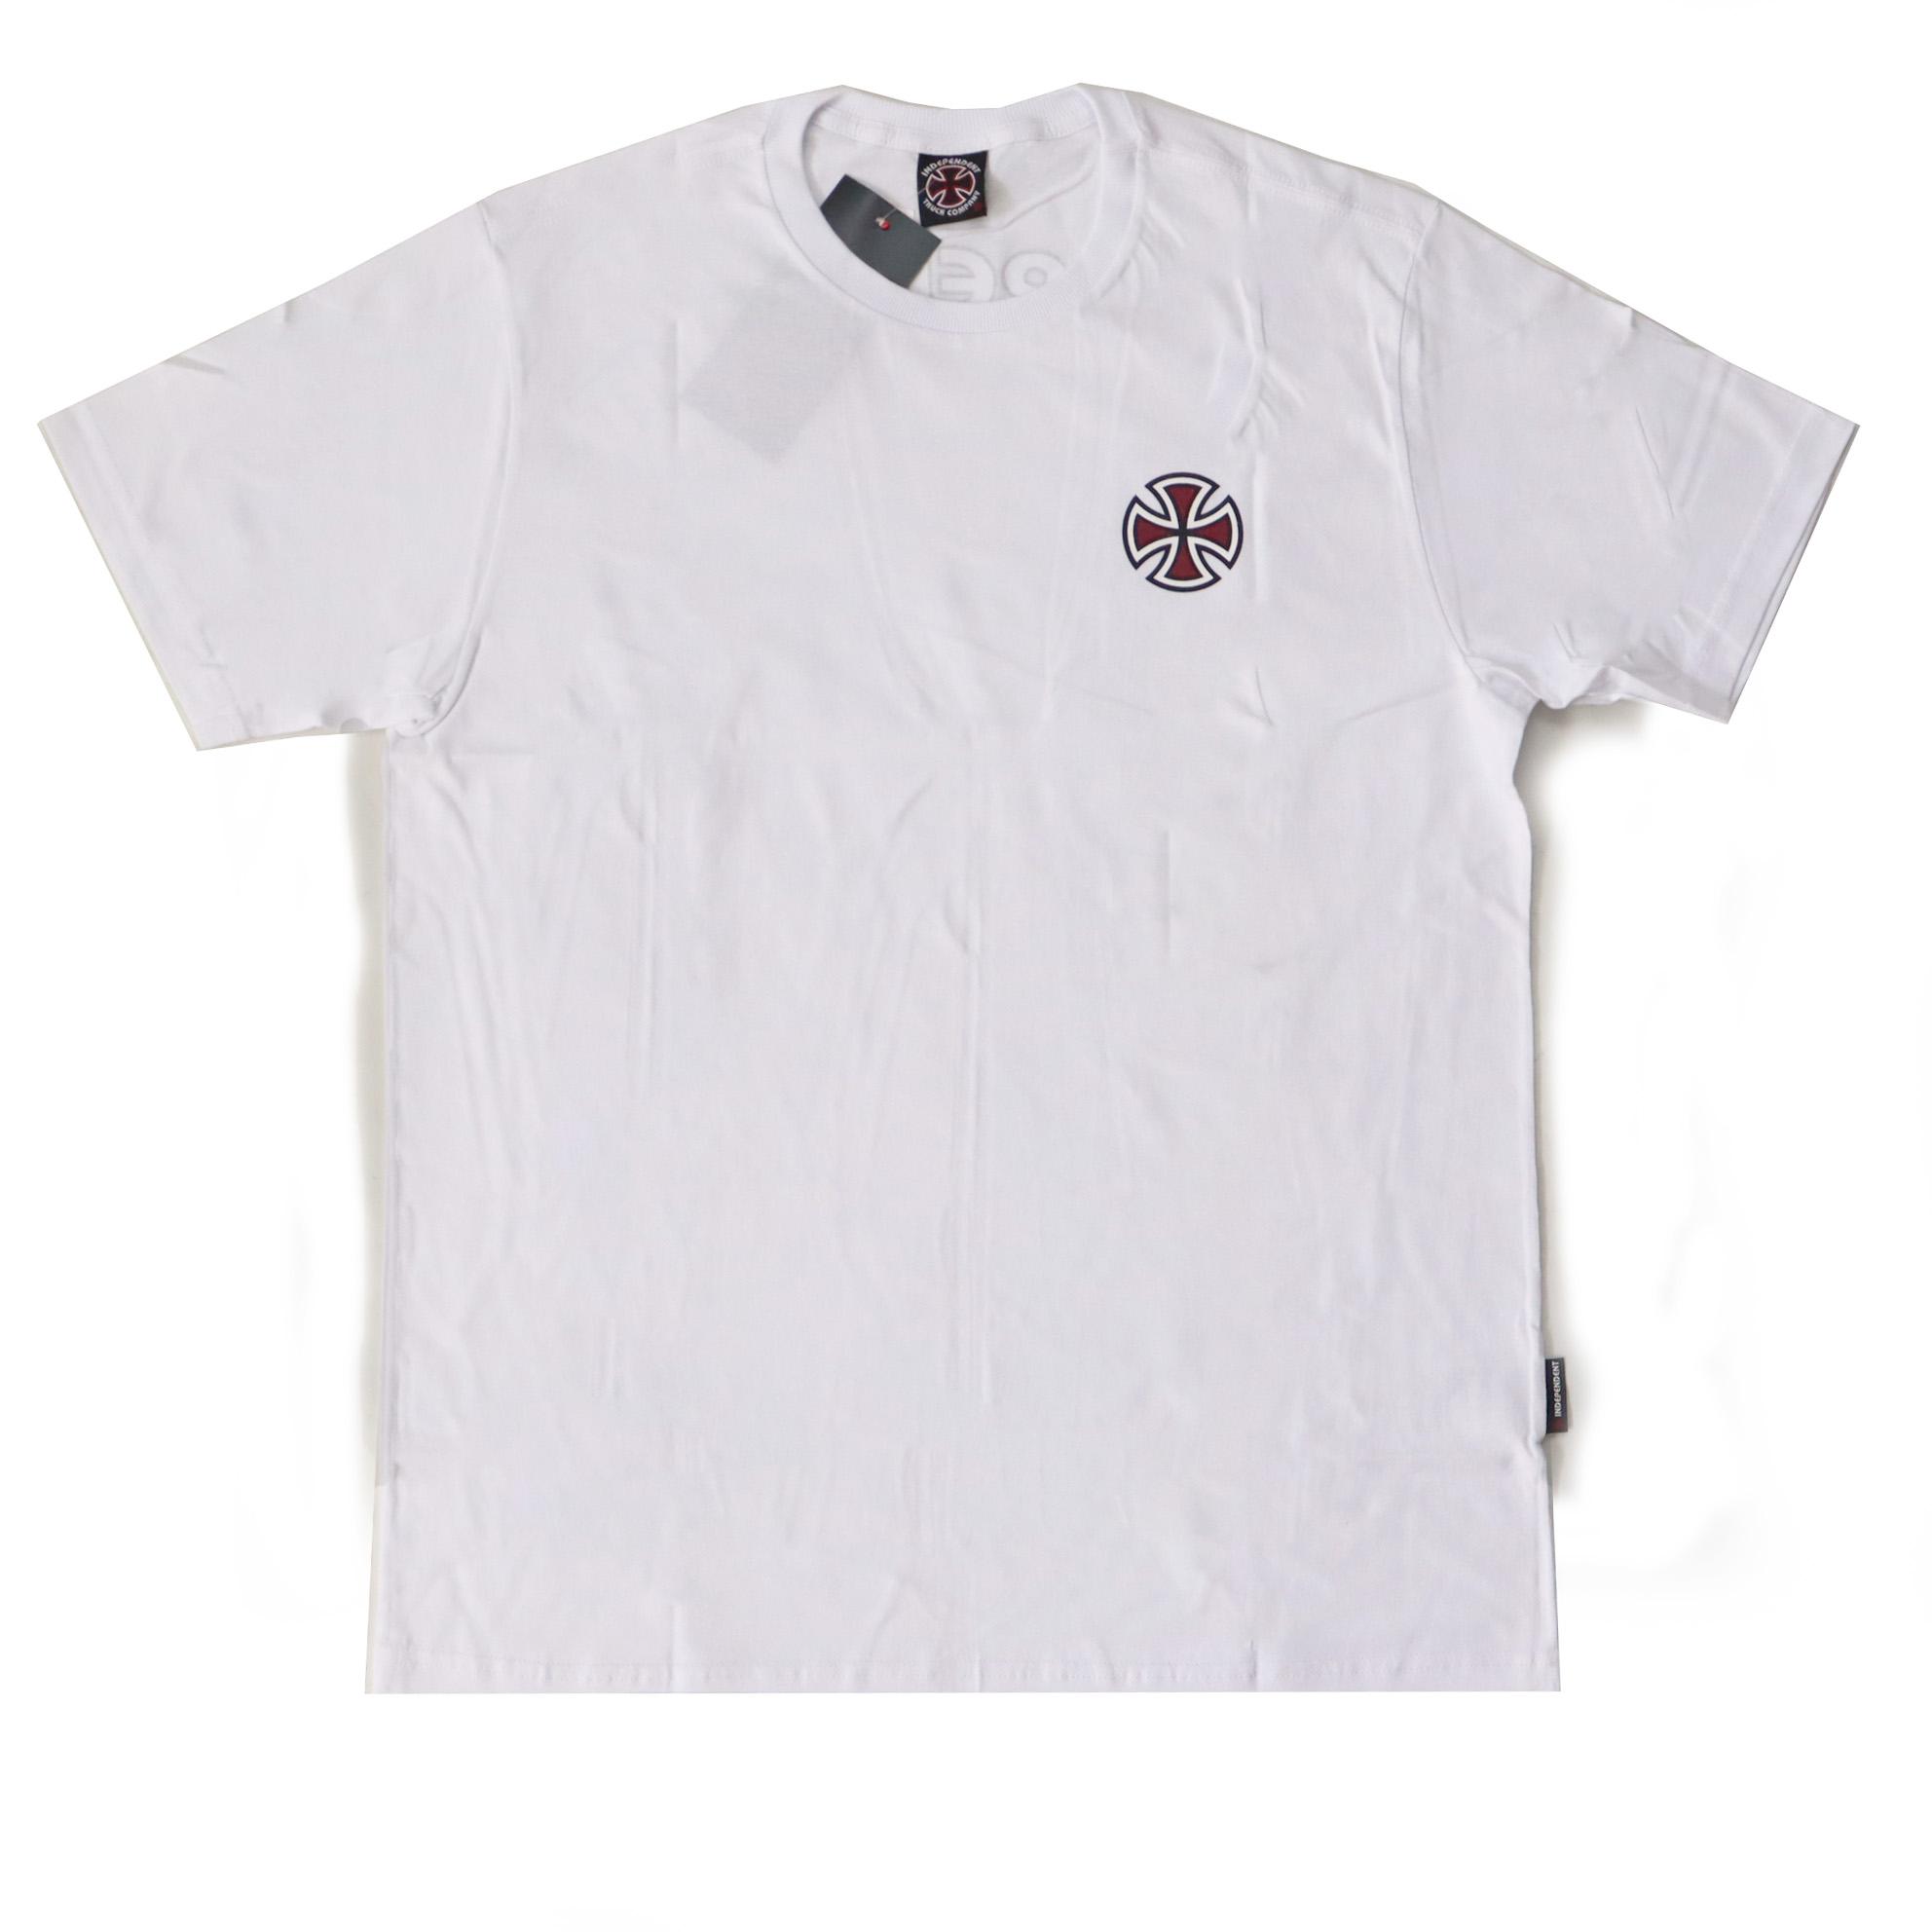 Camiseta Independent Nobs - Branco